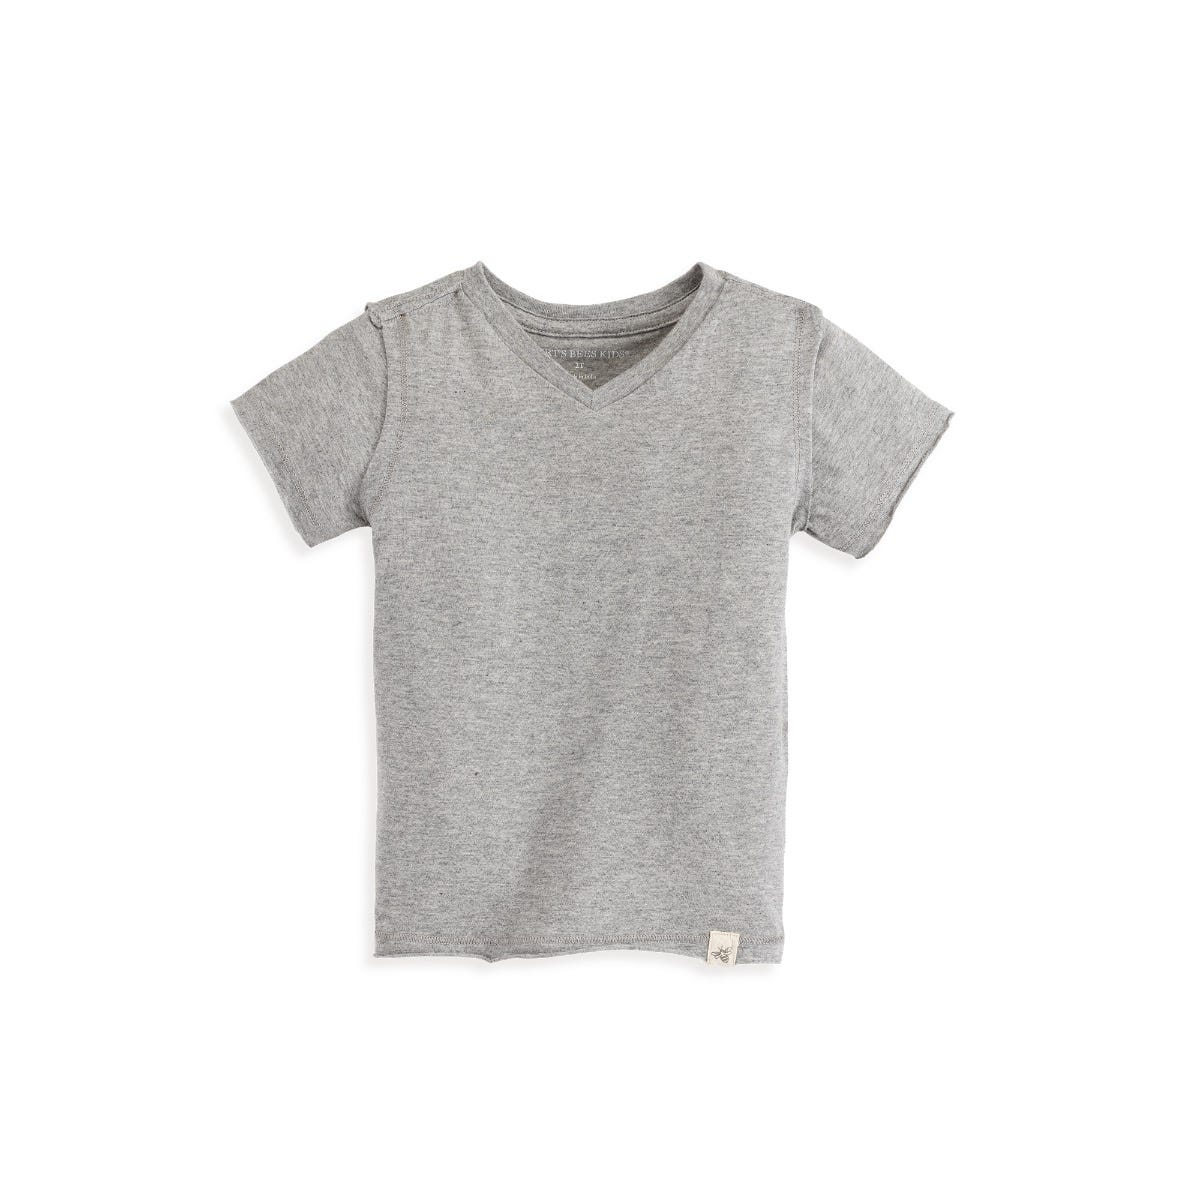 6-9 Months Moon and Back Set of 5 Organic V-Neck Short-Sleeve T-Shirts Grey Multi